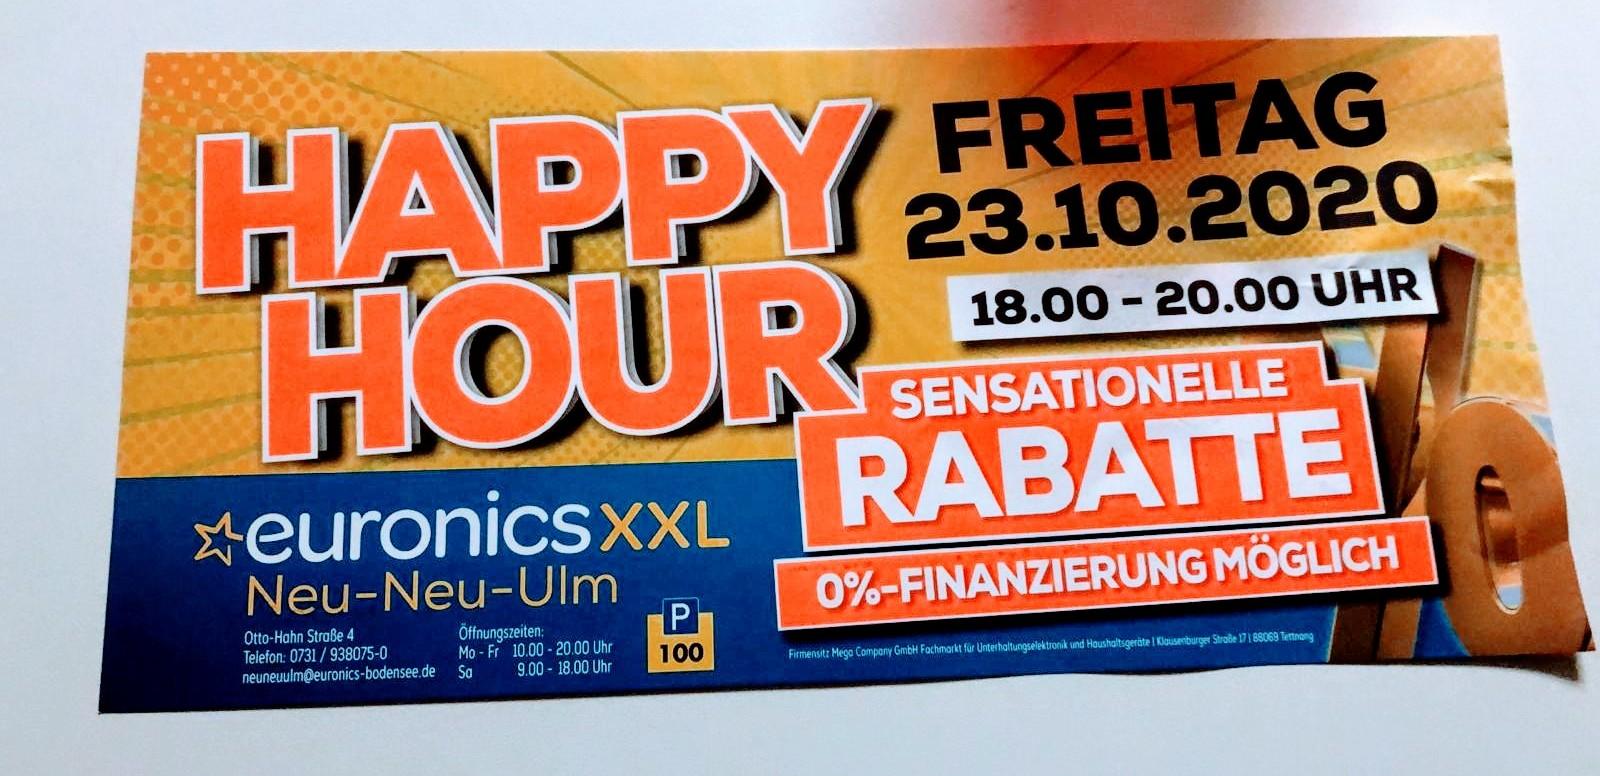 Lokal? | Euronics Neu-Ulm | Happy Hour 23.10.2020 | 18:00 - 20:00 Uhr | bis zu -20%